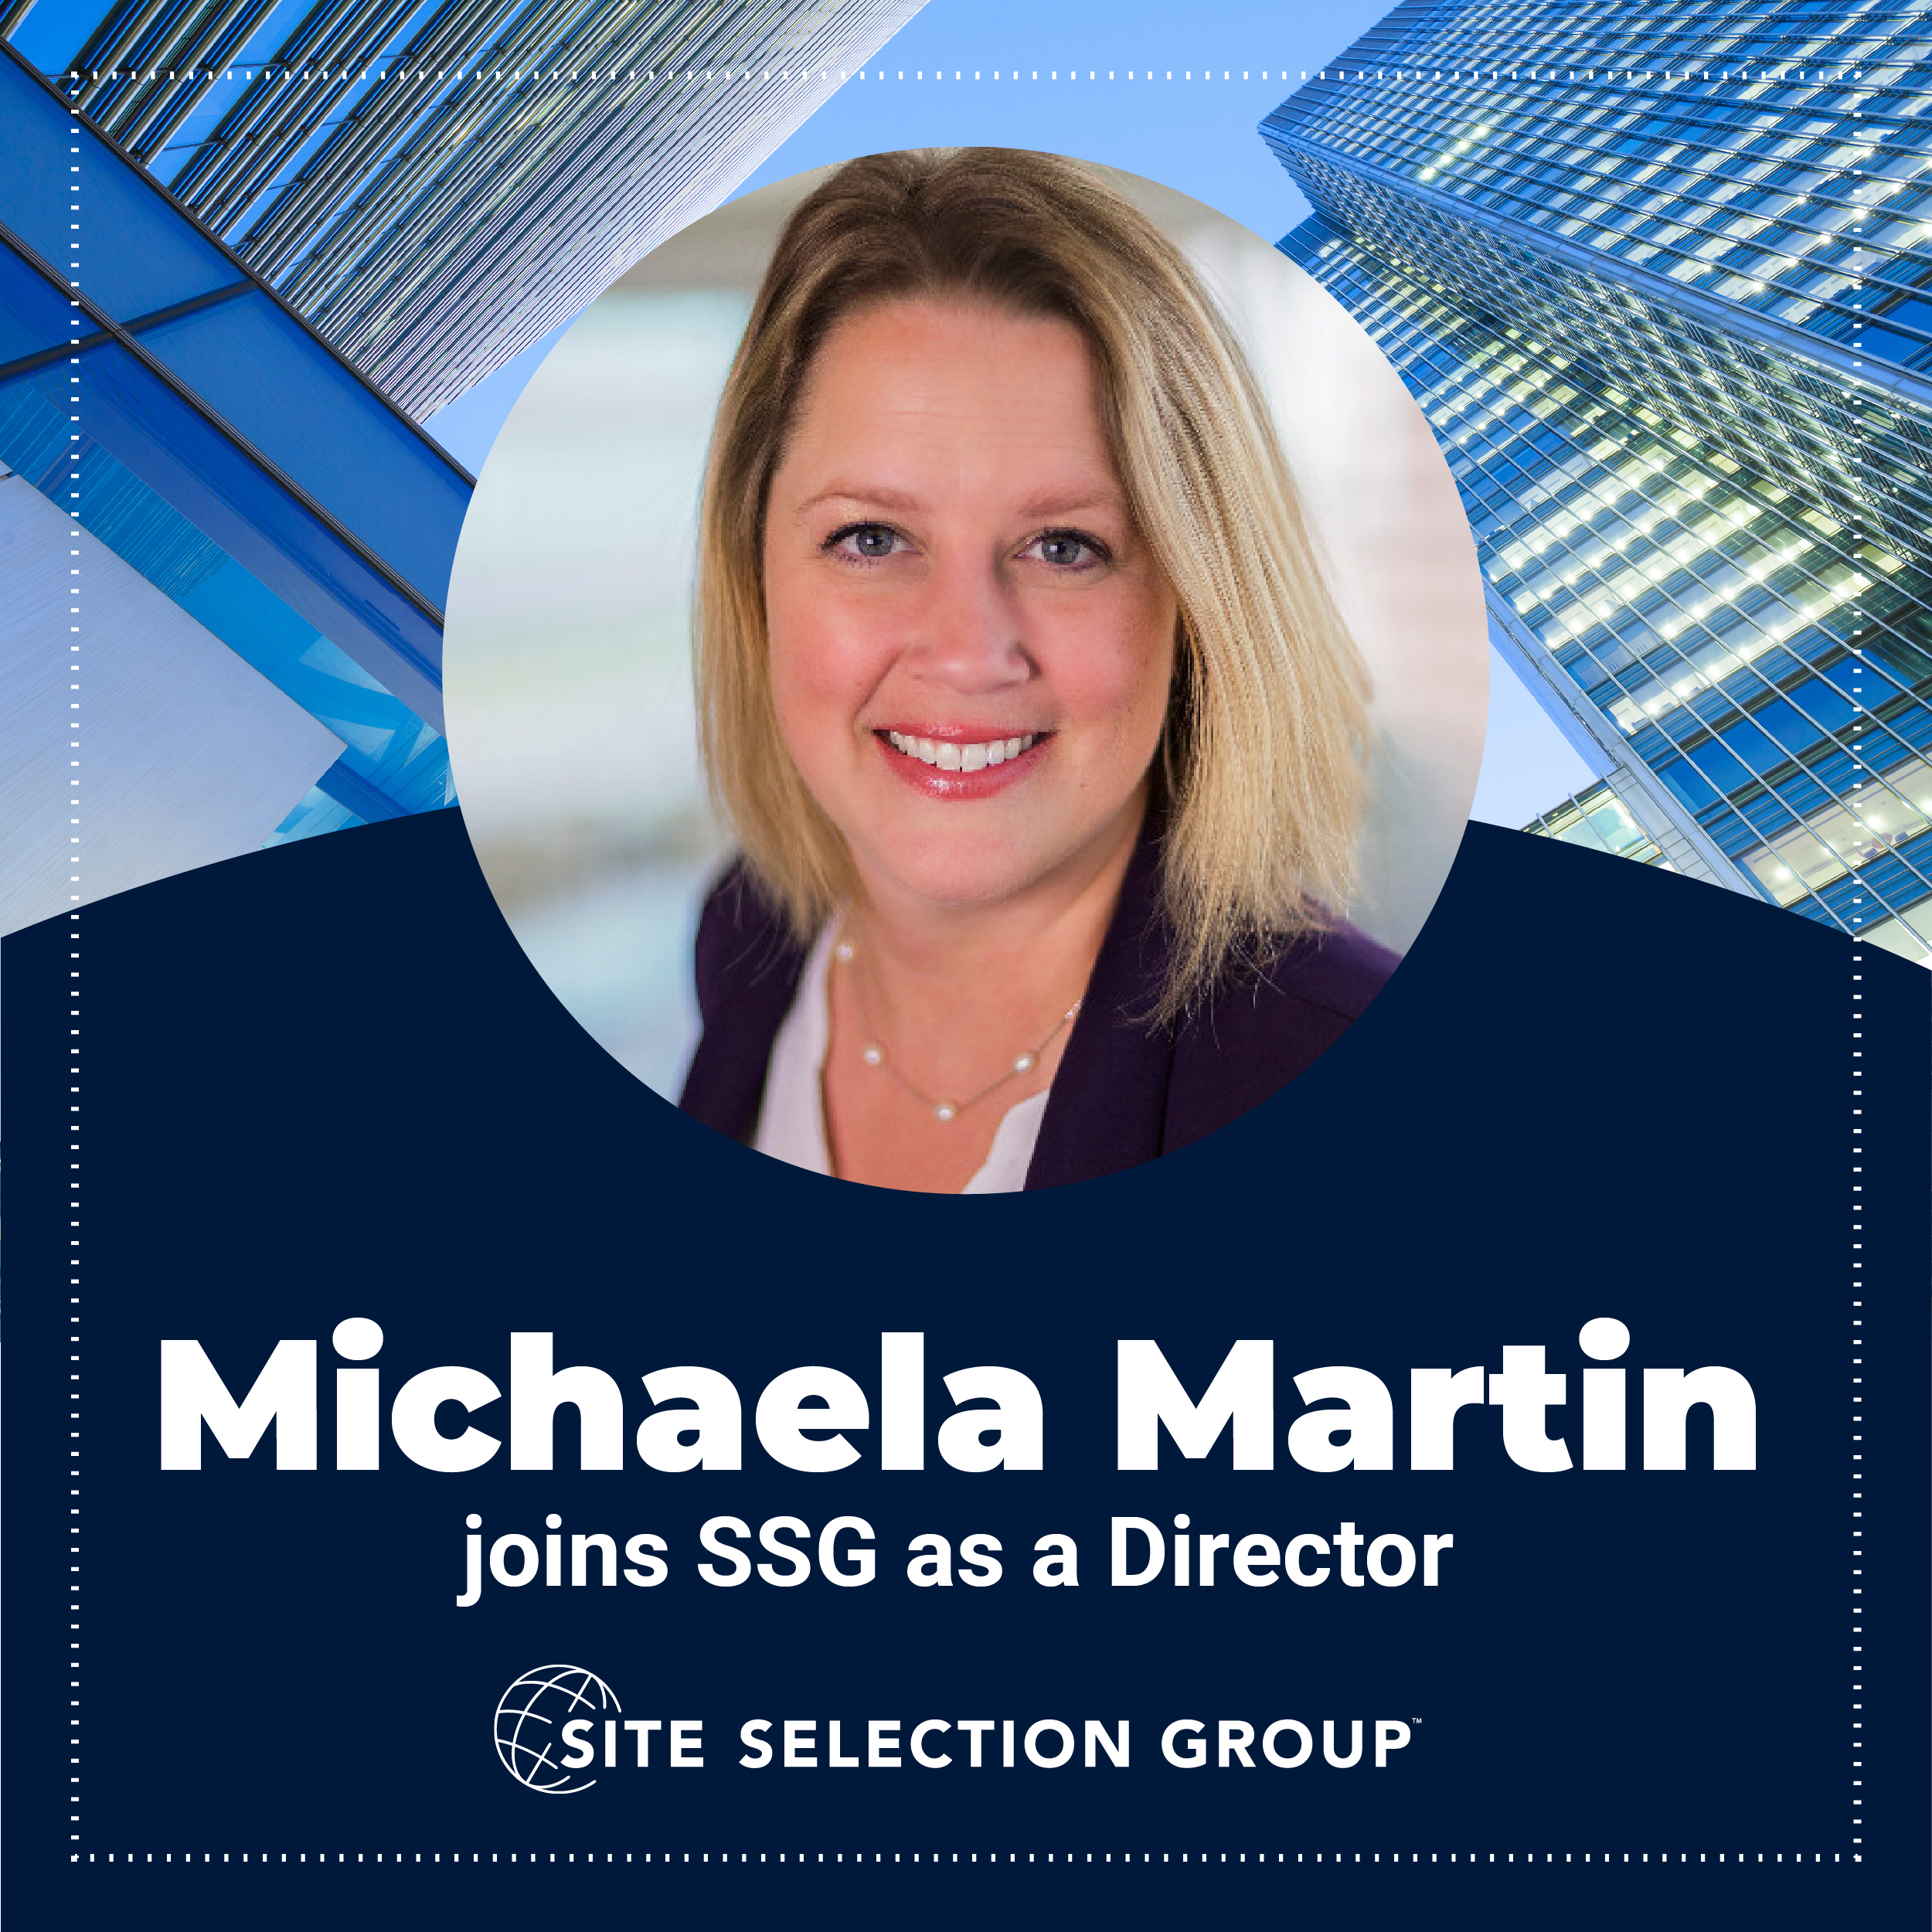 Michaela-Martin-0921-01